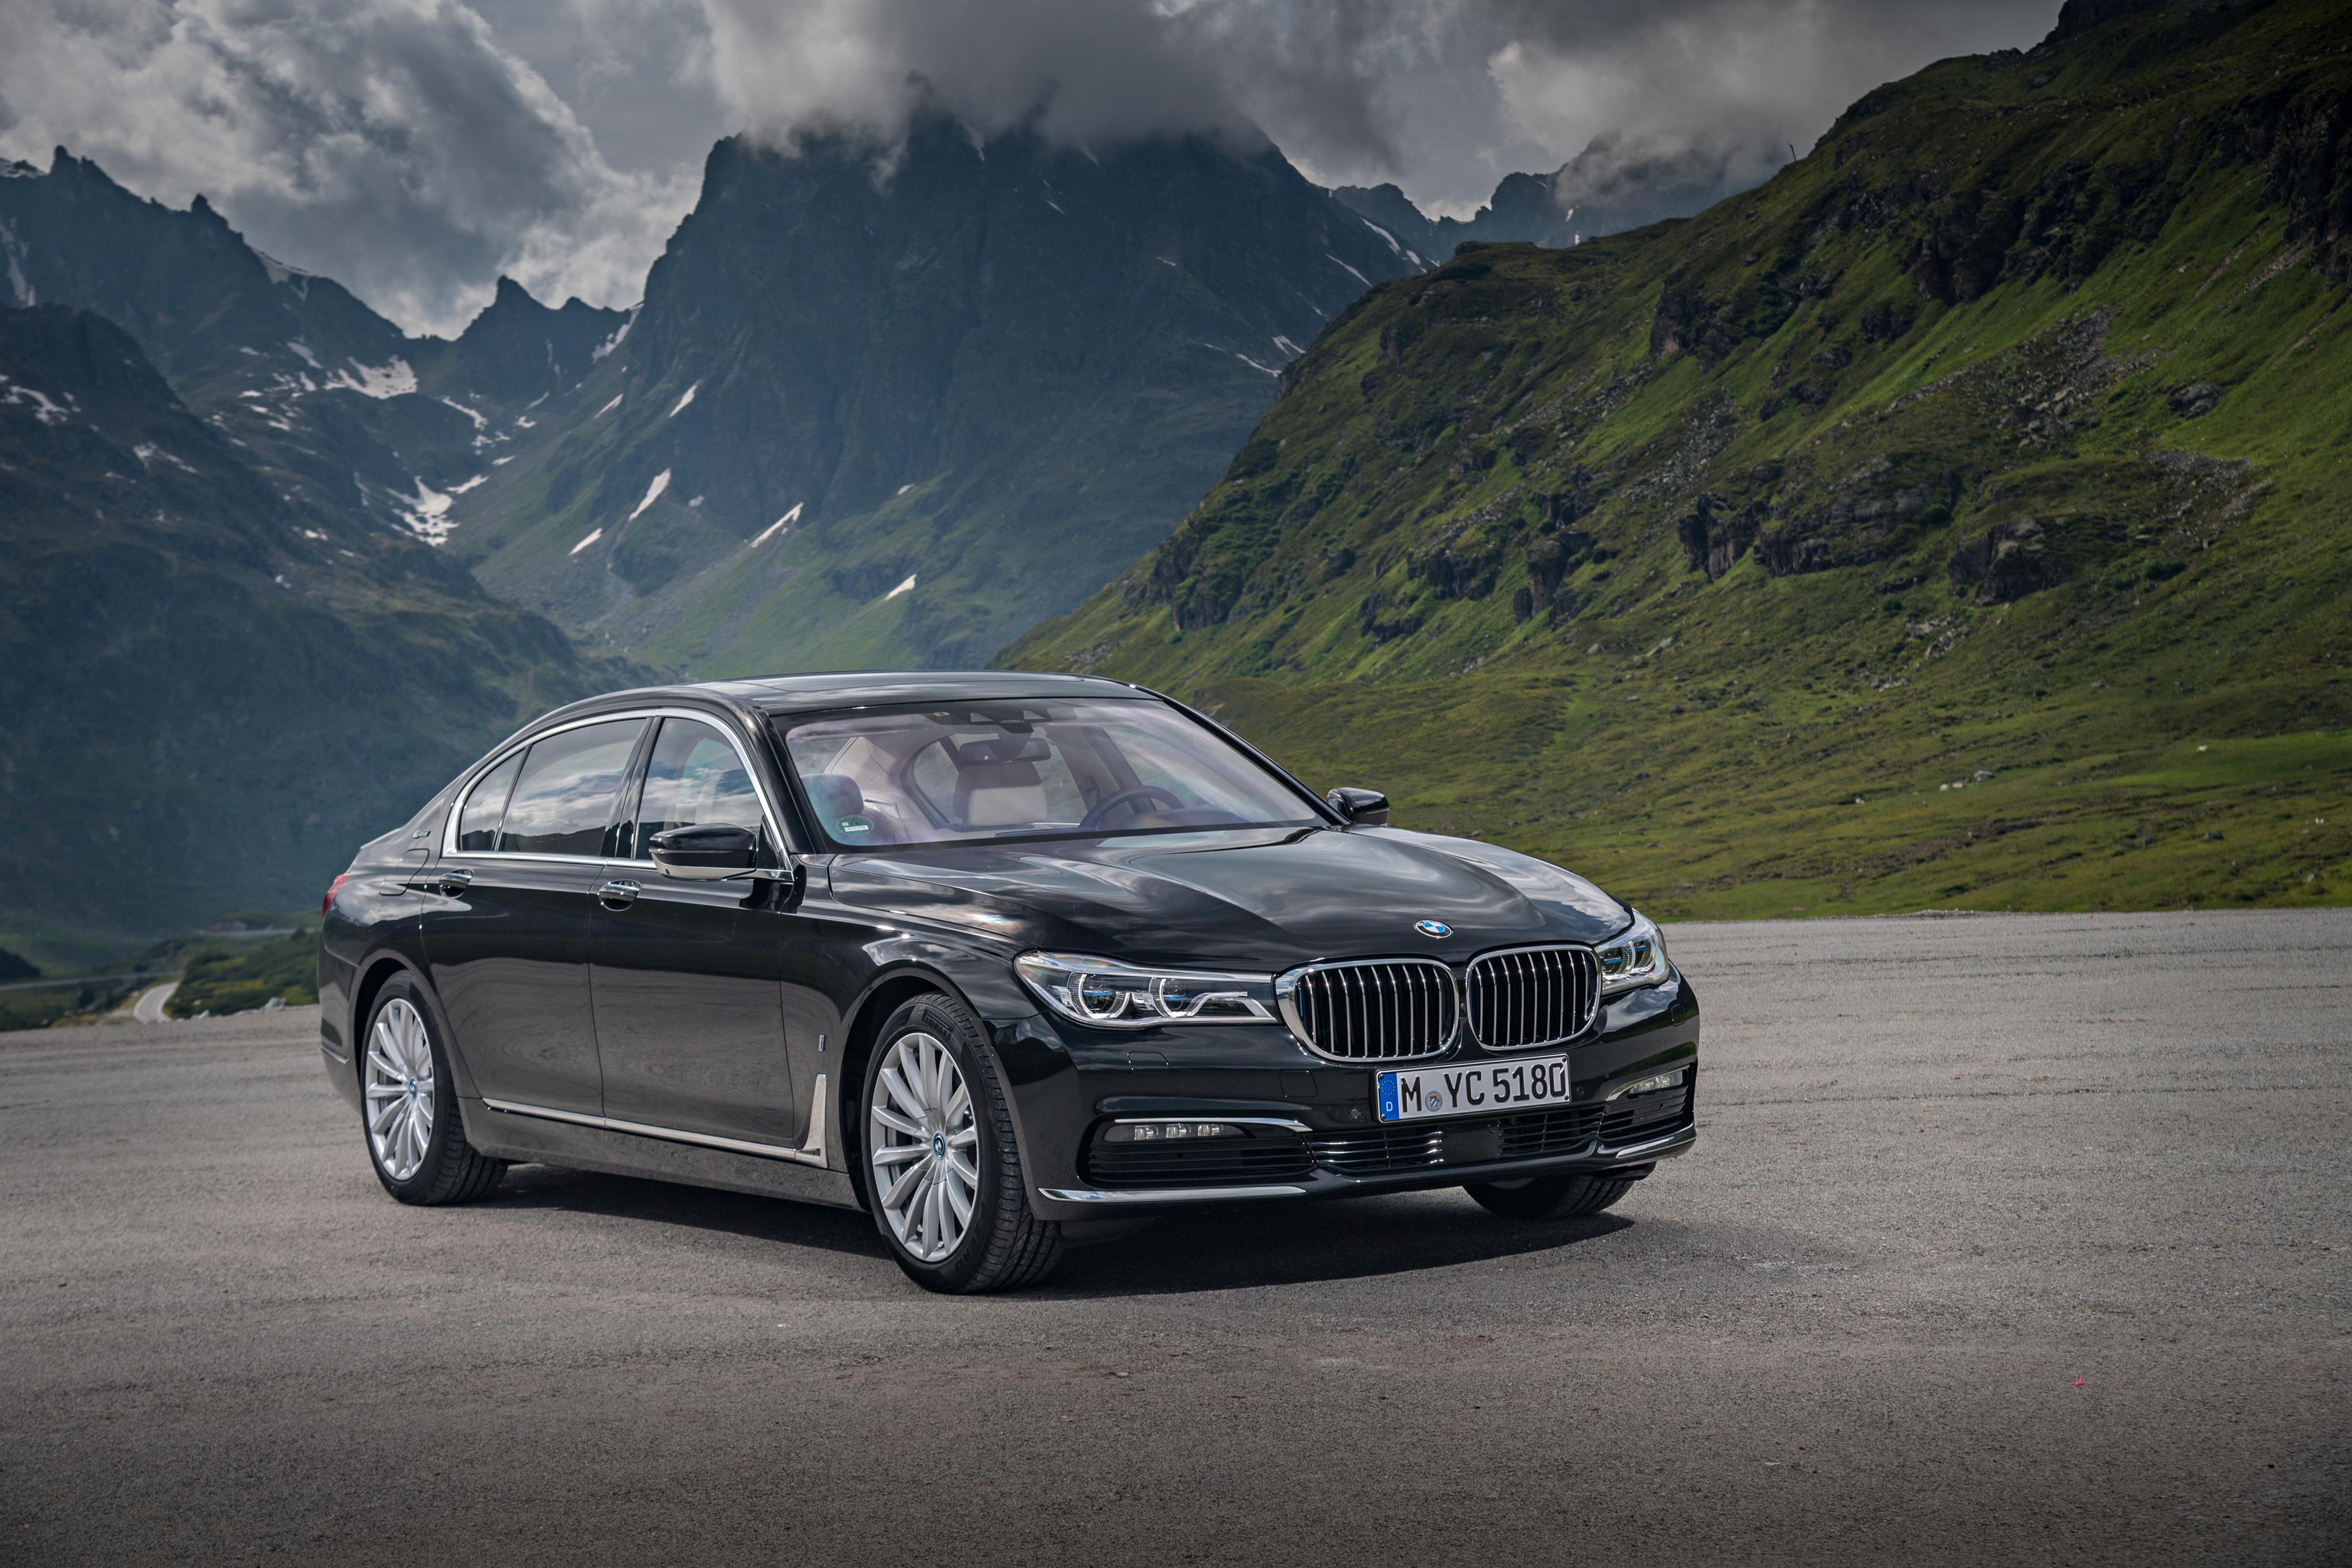 BMW 7 Series 4k Ultra HD Wallpaper   Background Image ...